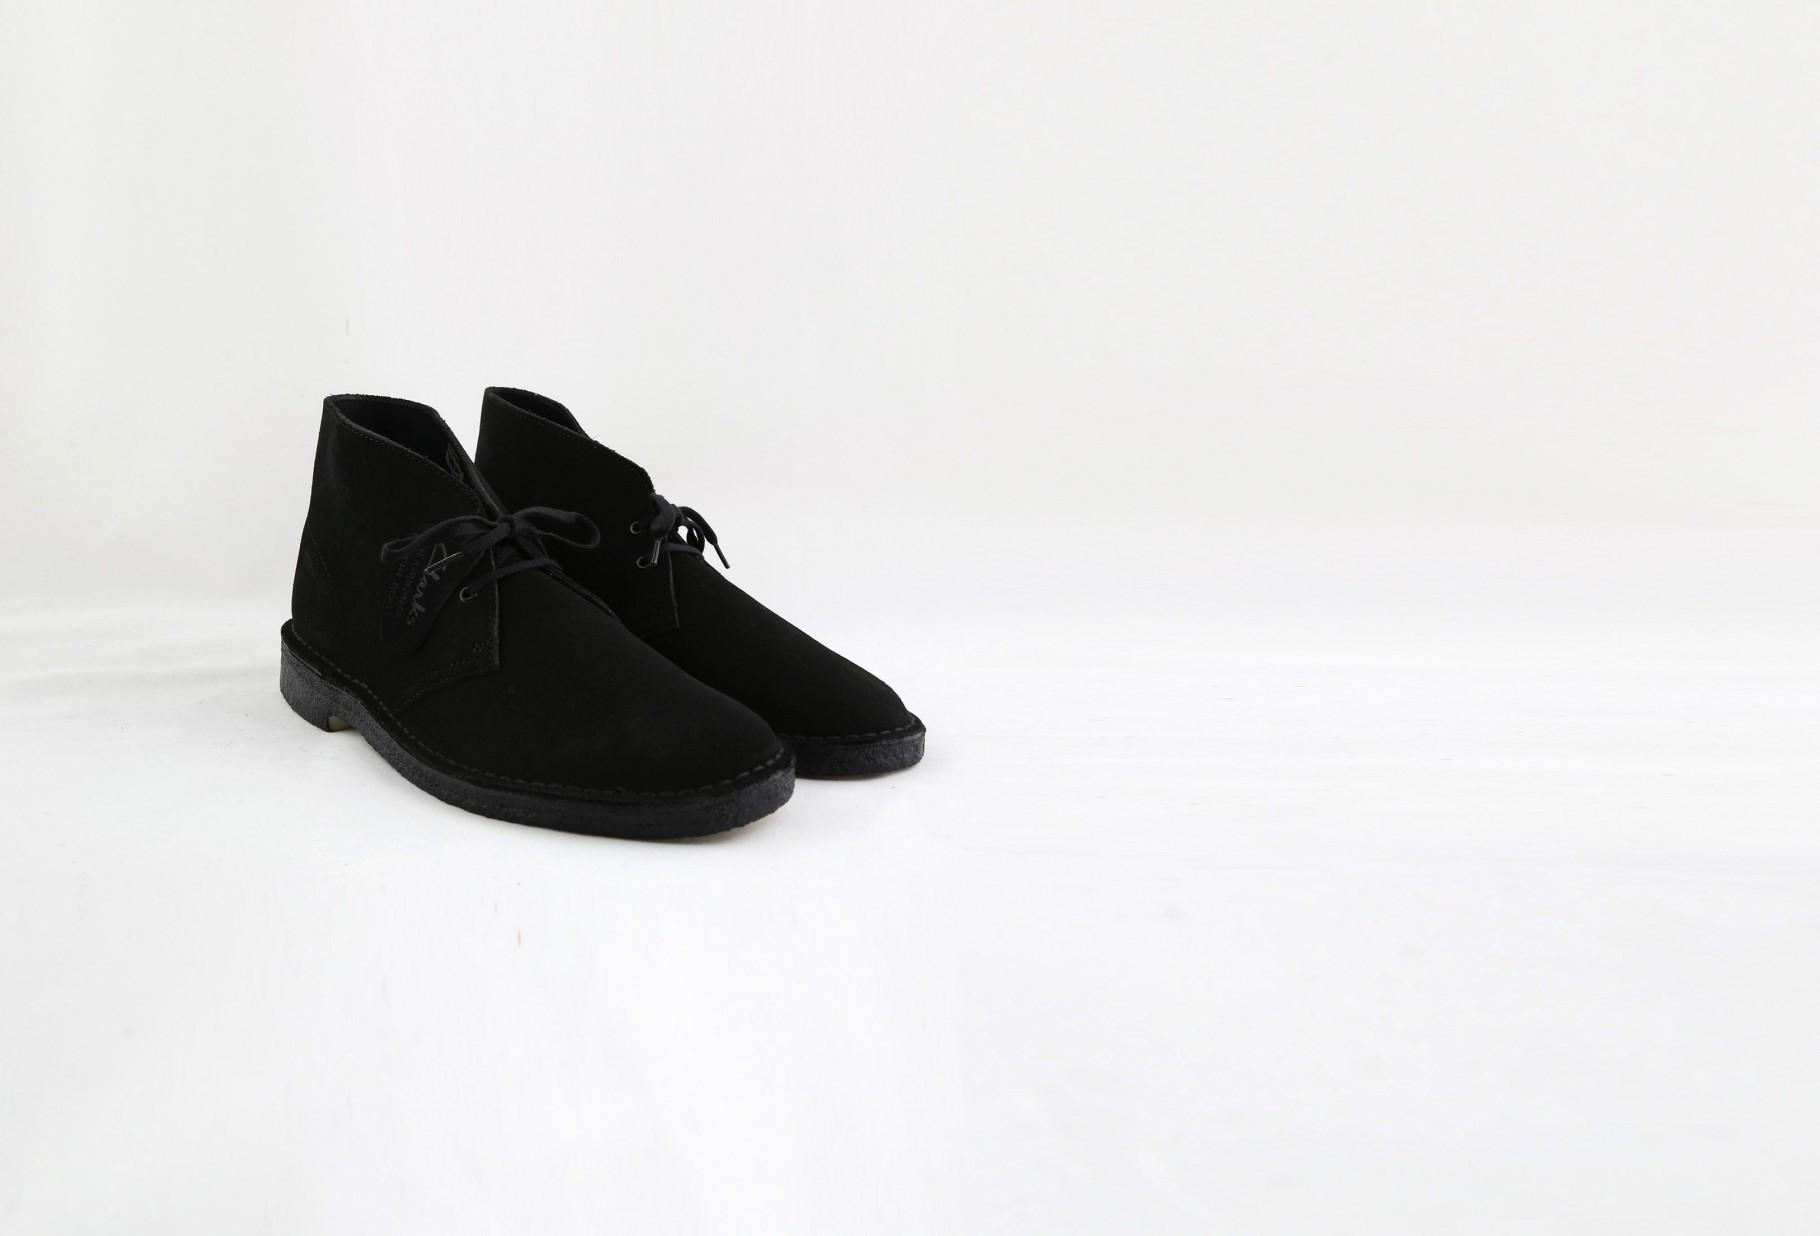 CLARKS ORIGINALS / Desert boot black suede Black suede